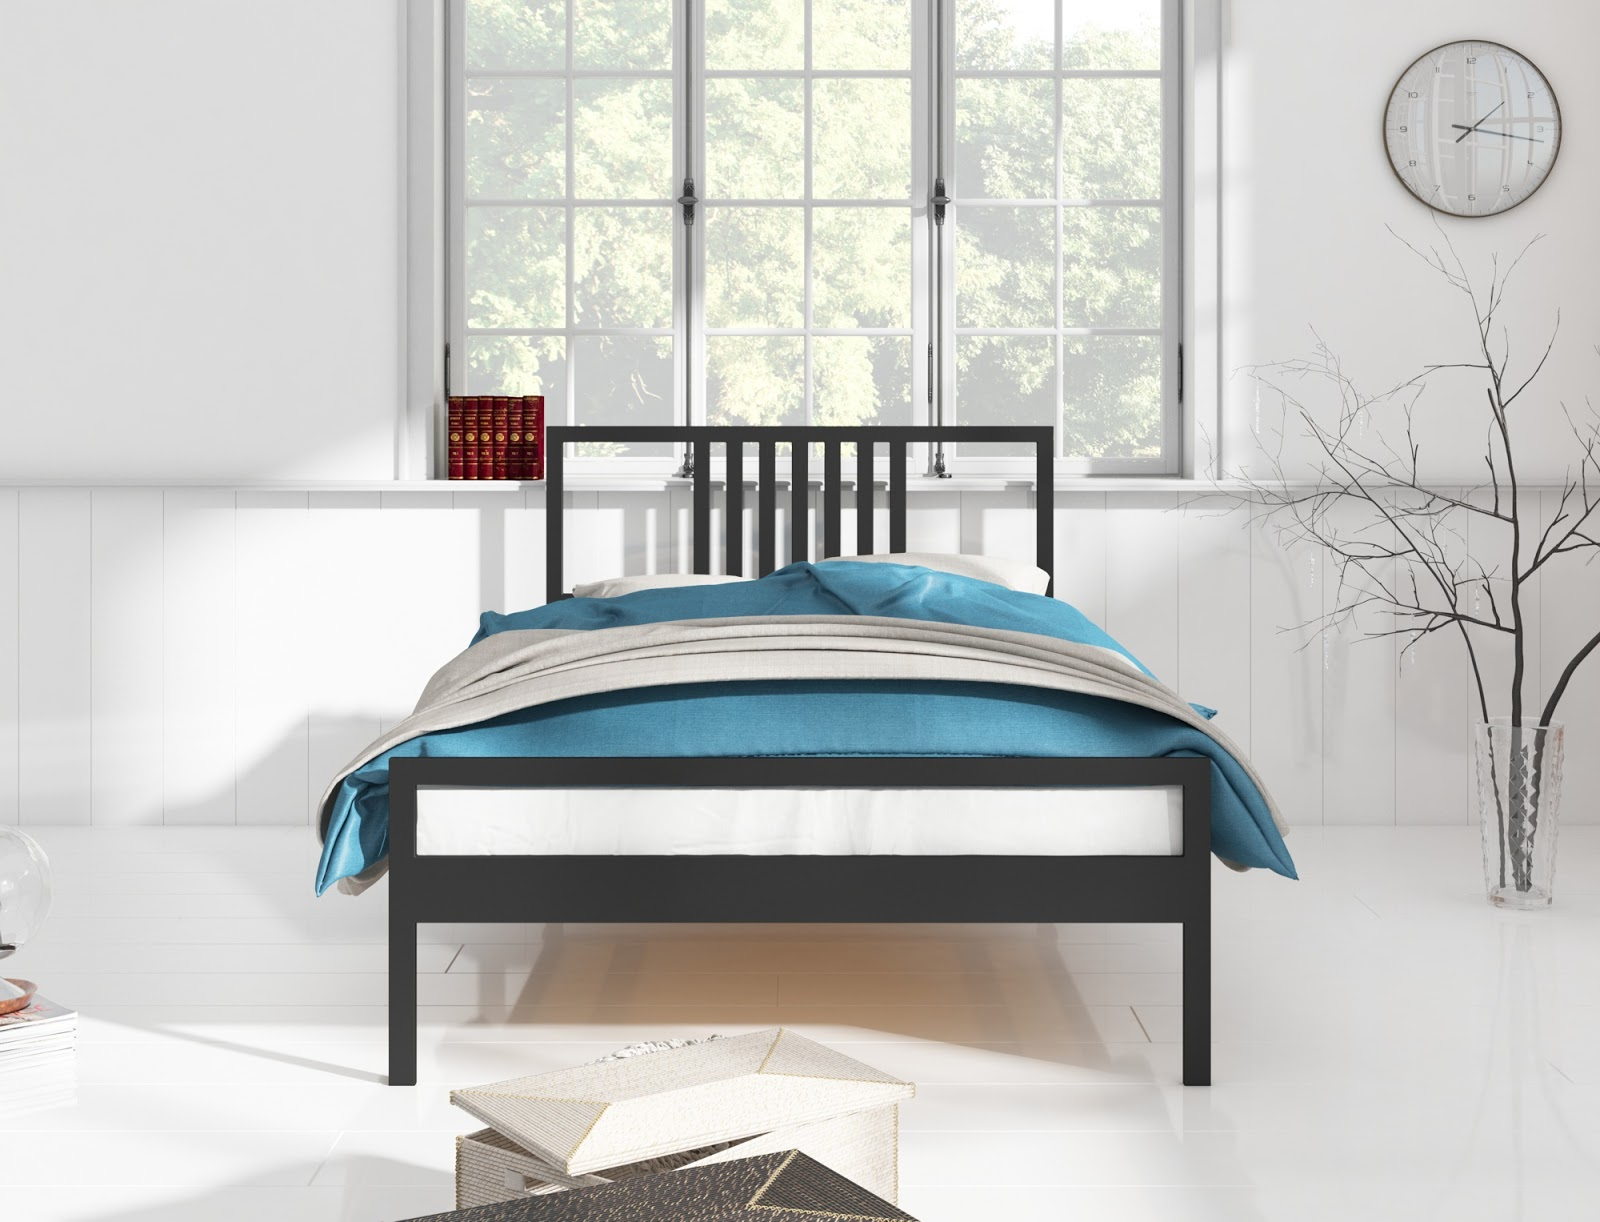 Łóżko metalowe wzór 34